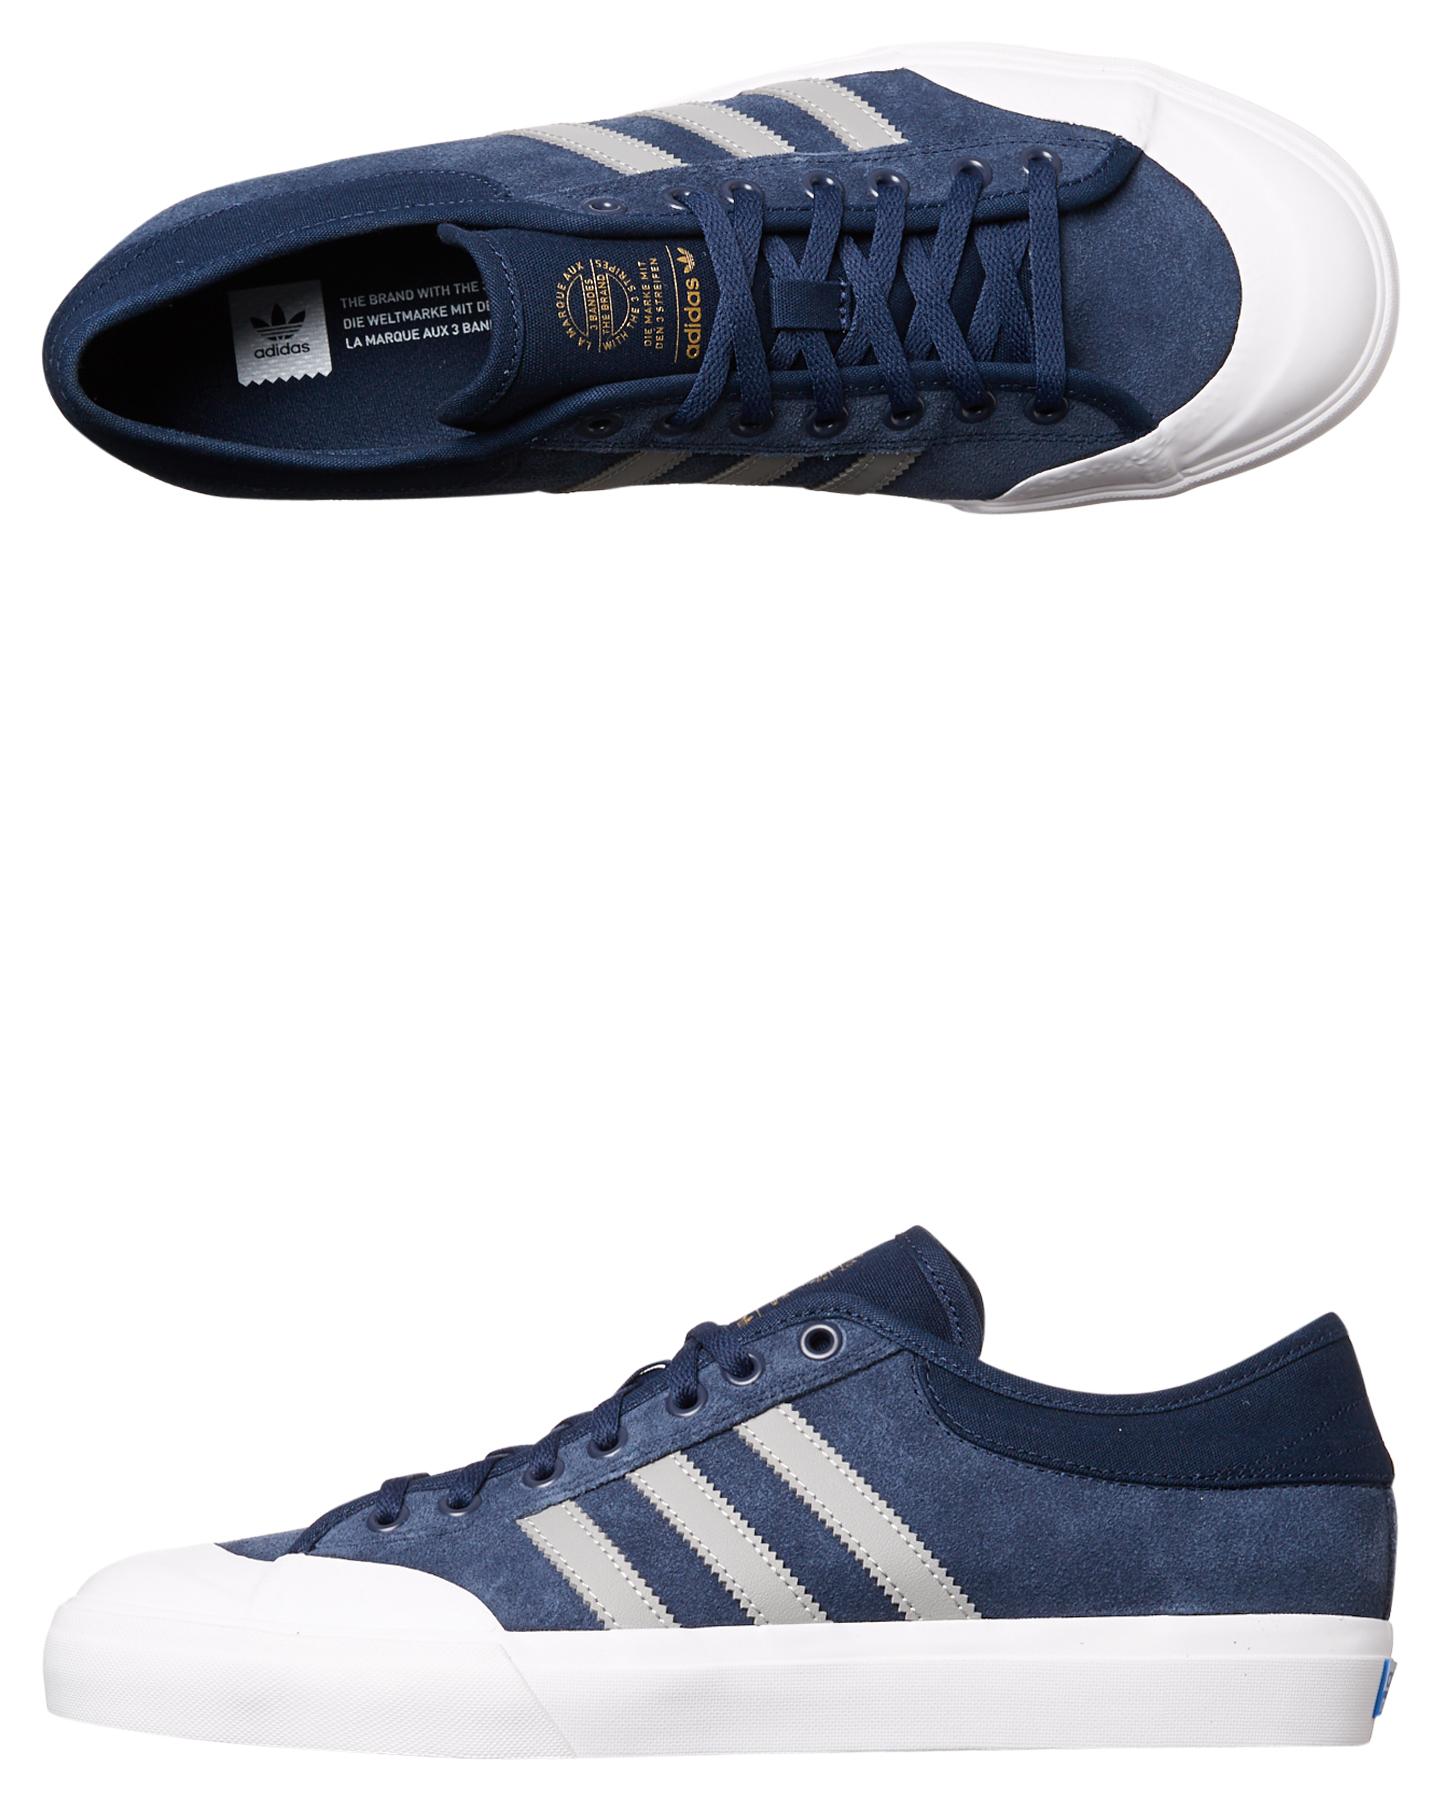 NAVY SOLID MENS FOOTWEAR ADIDAS ORIGINALS SNEAKERS - SSBY3983NVYM ...